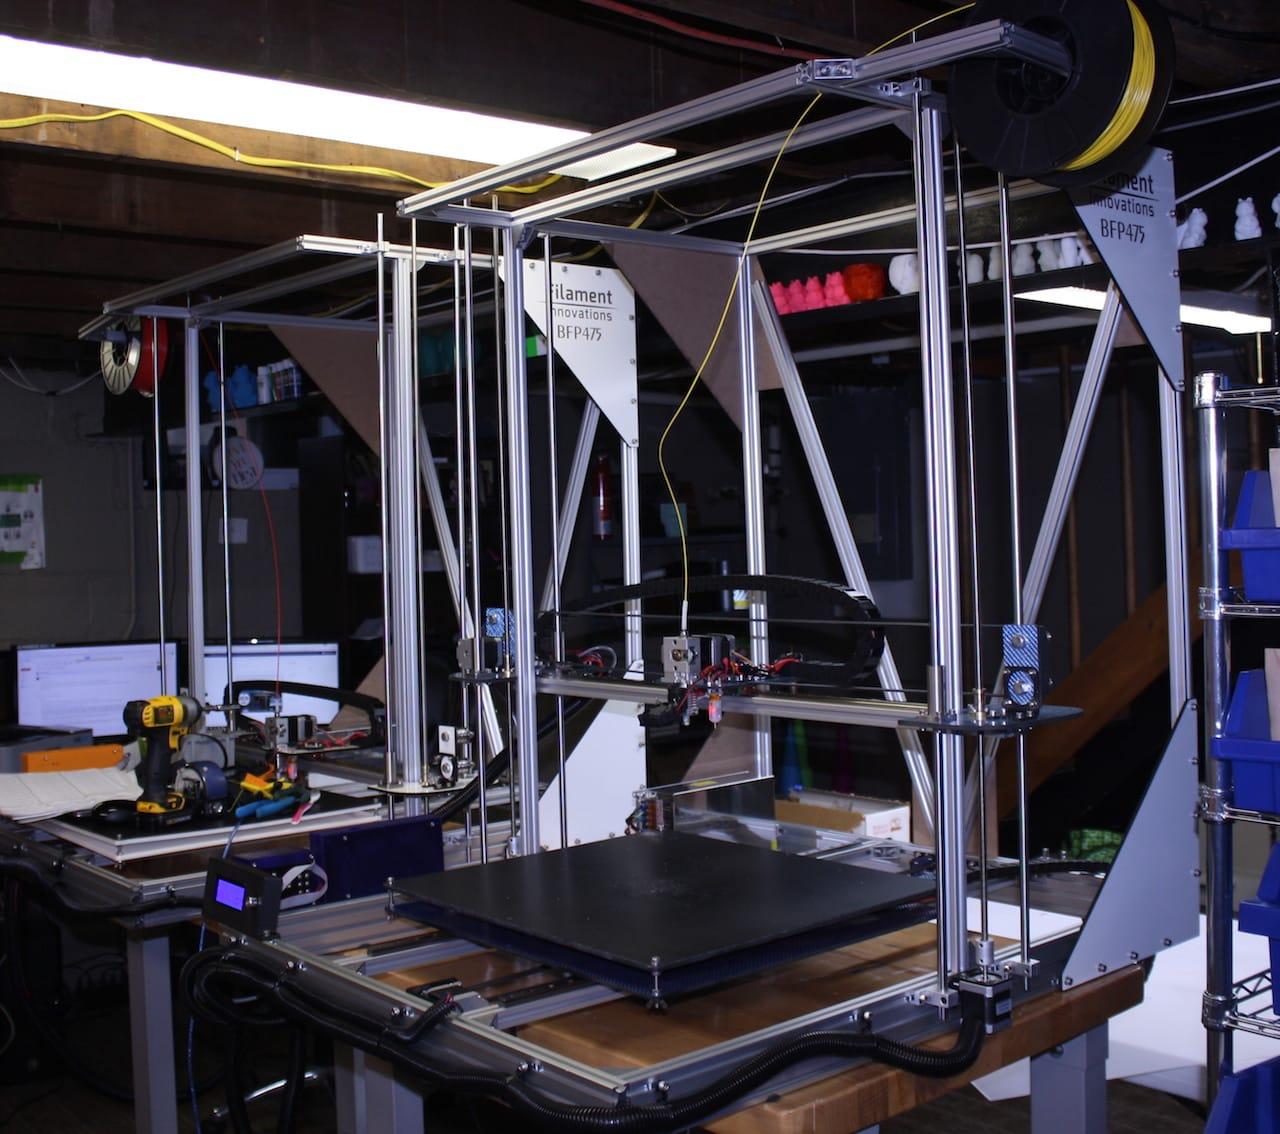 The BP475 Large Format Desktop 3D Printer: Made With Carbon Fiber